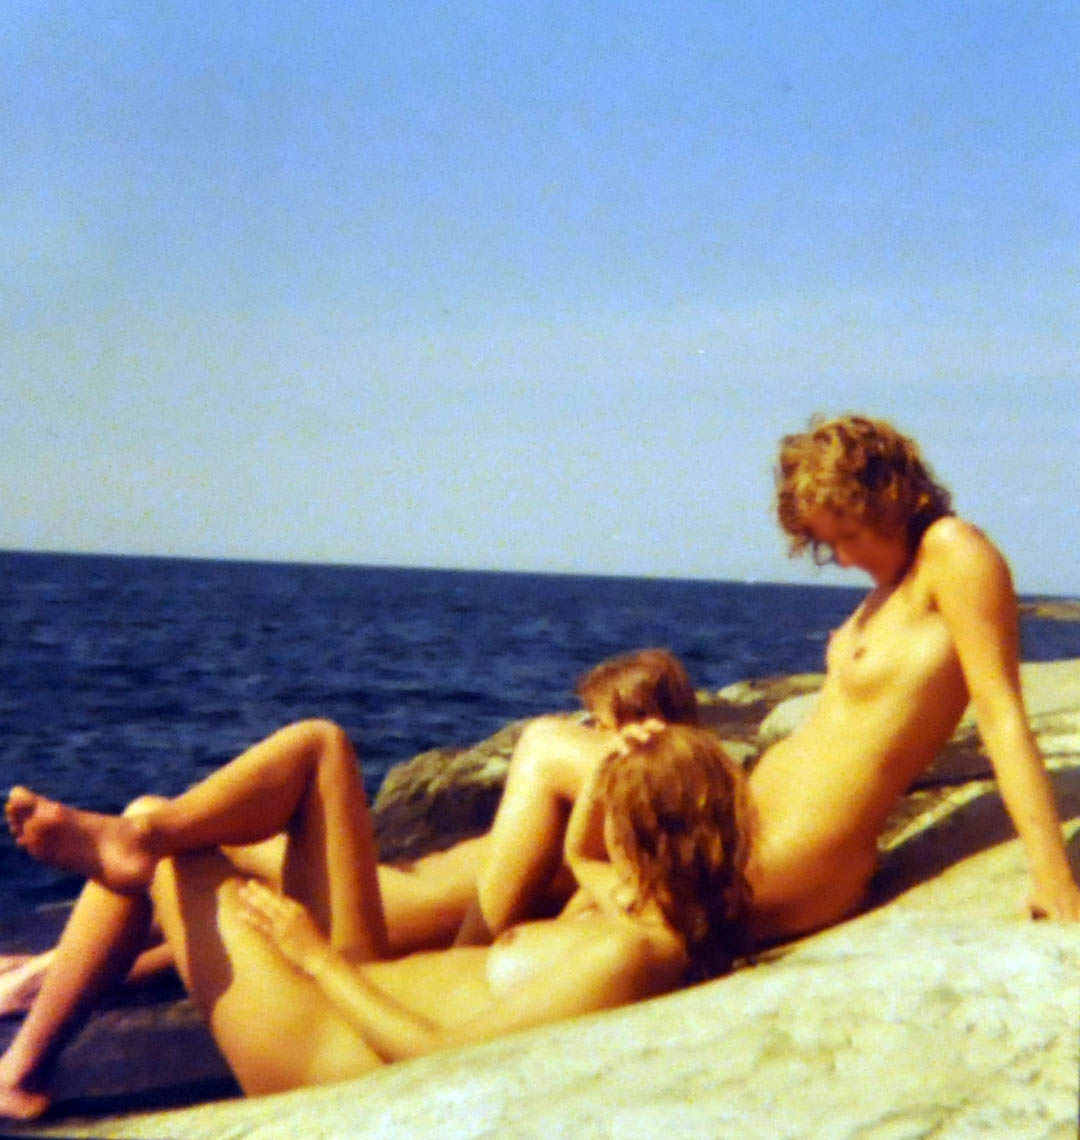 nakenbad maspalomas nakna amatör tjejer